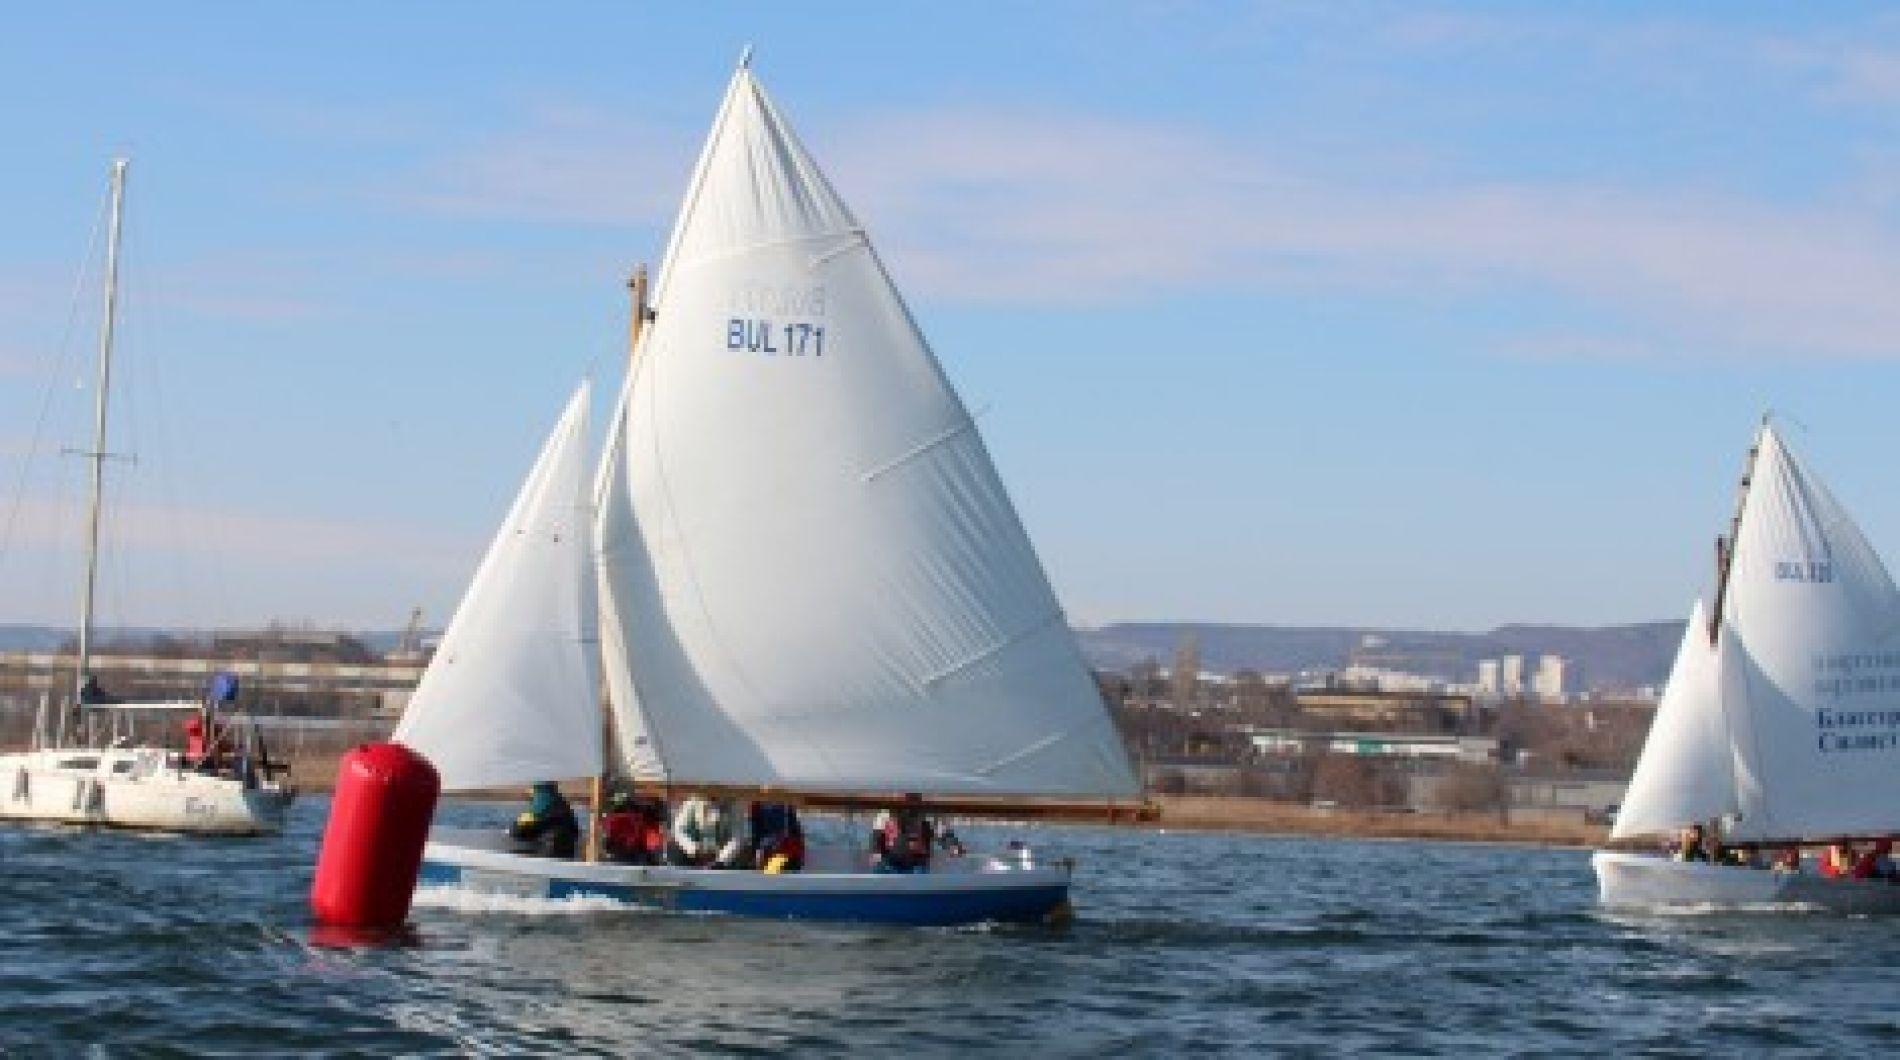 Preparations for the regatta start on March 3 in Varna